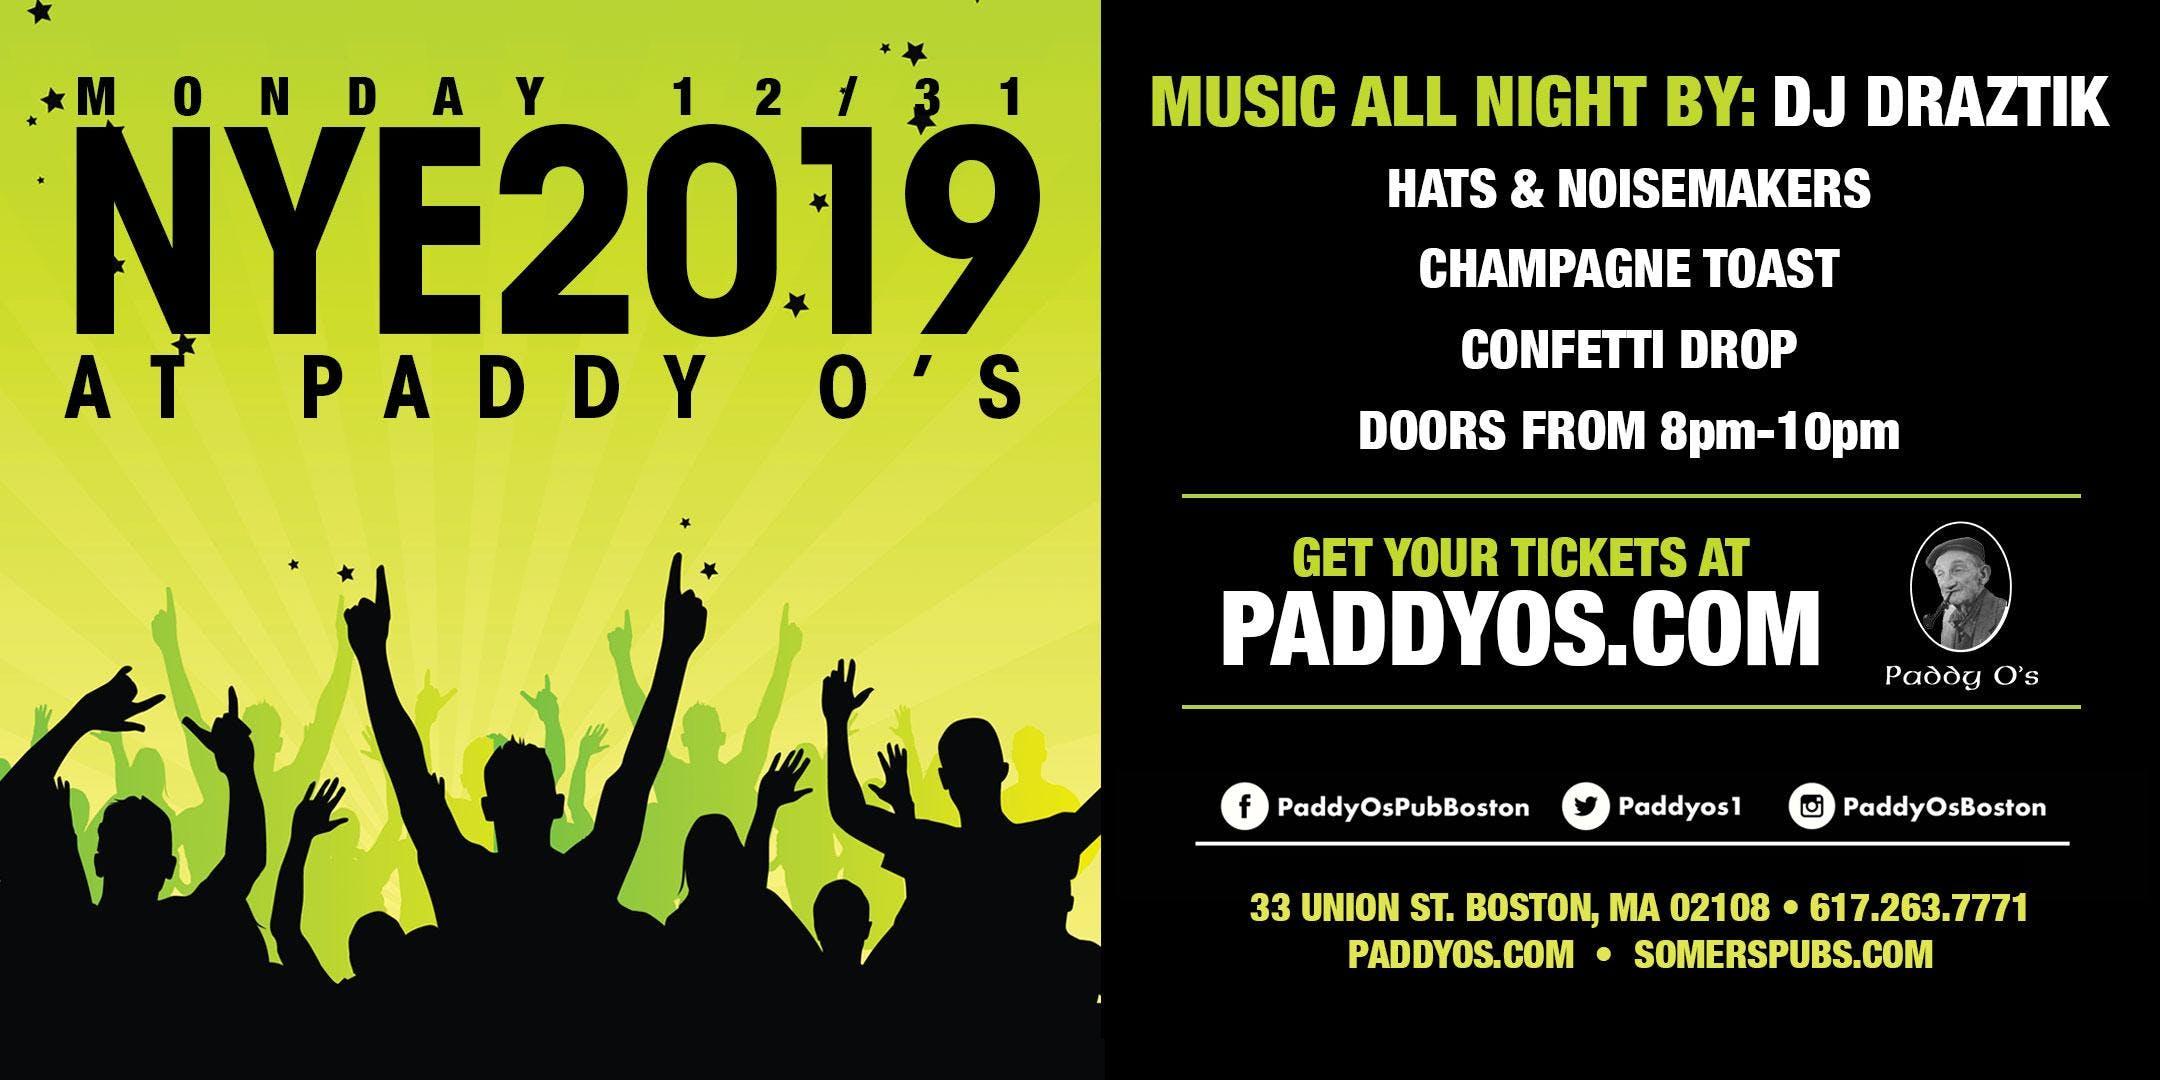 Paddy O's NYE 2019